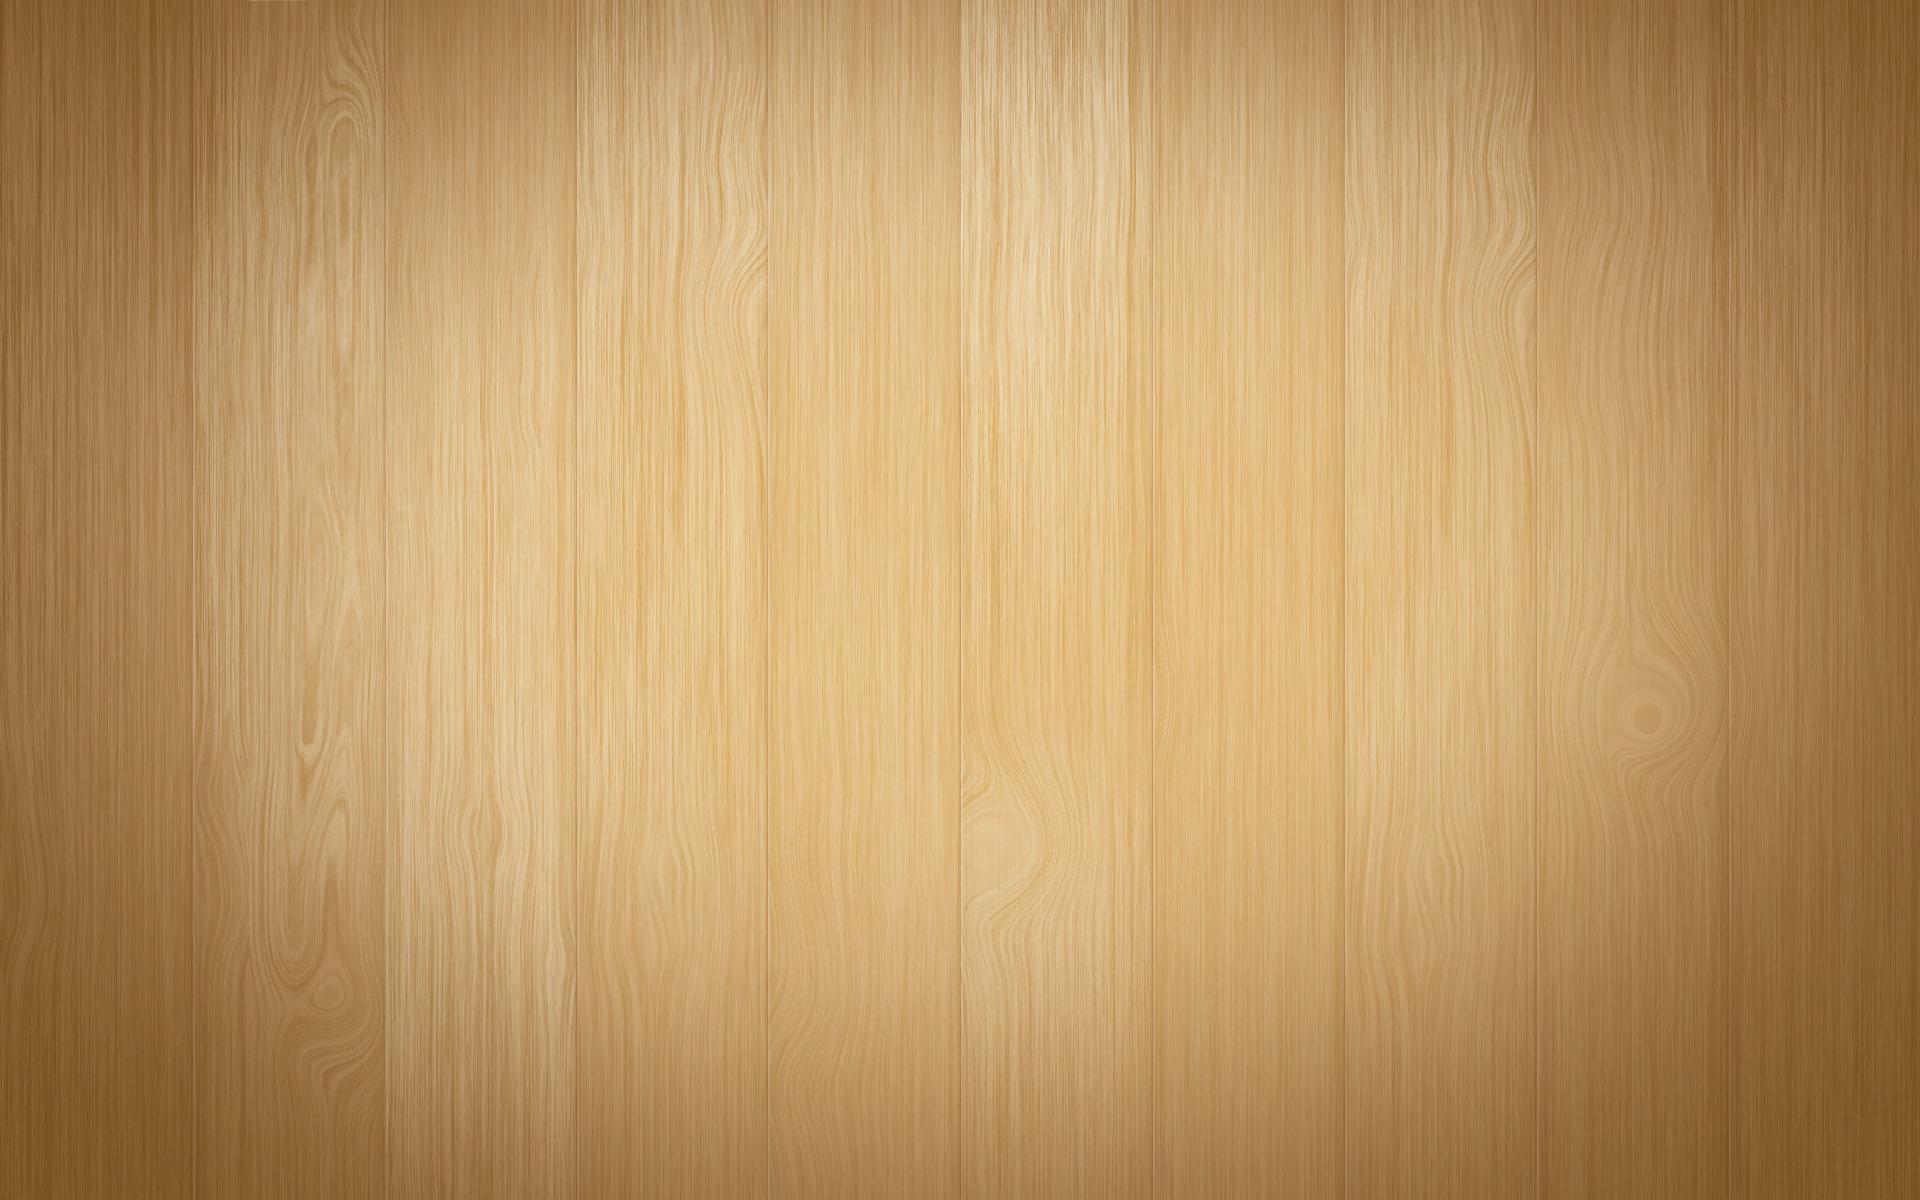 3d Wood Effect Wallpaper 15 Wood Plank Backgrounds Freecreatives